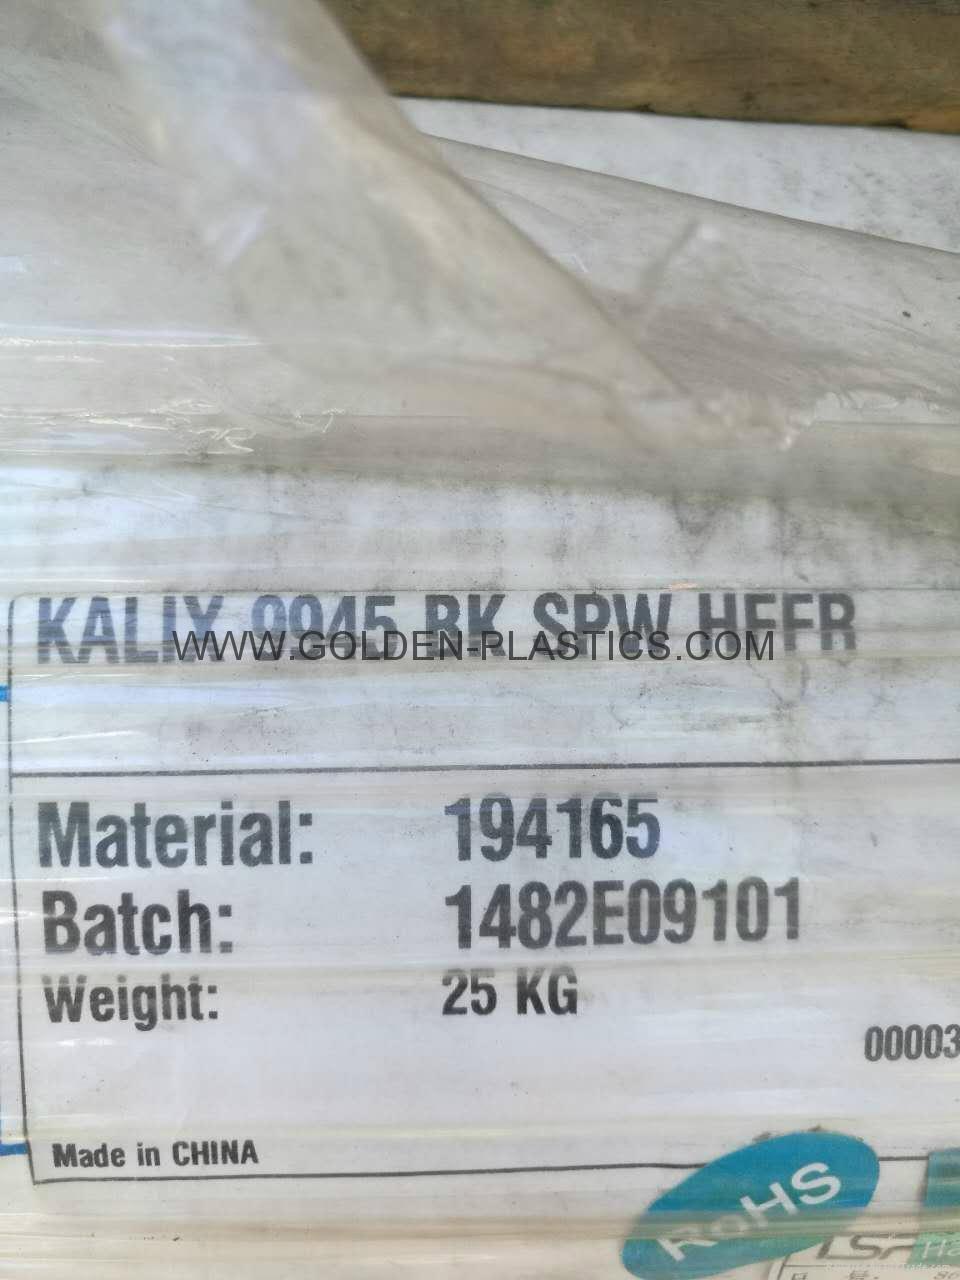 KALIX 9945 BK SPW HFFR